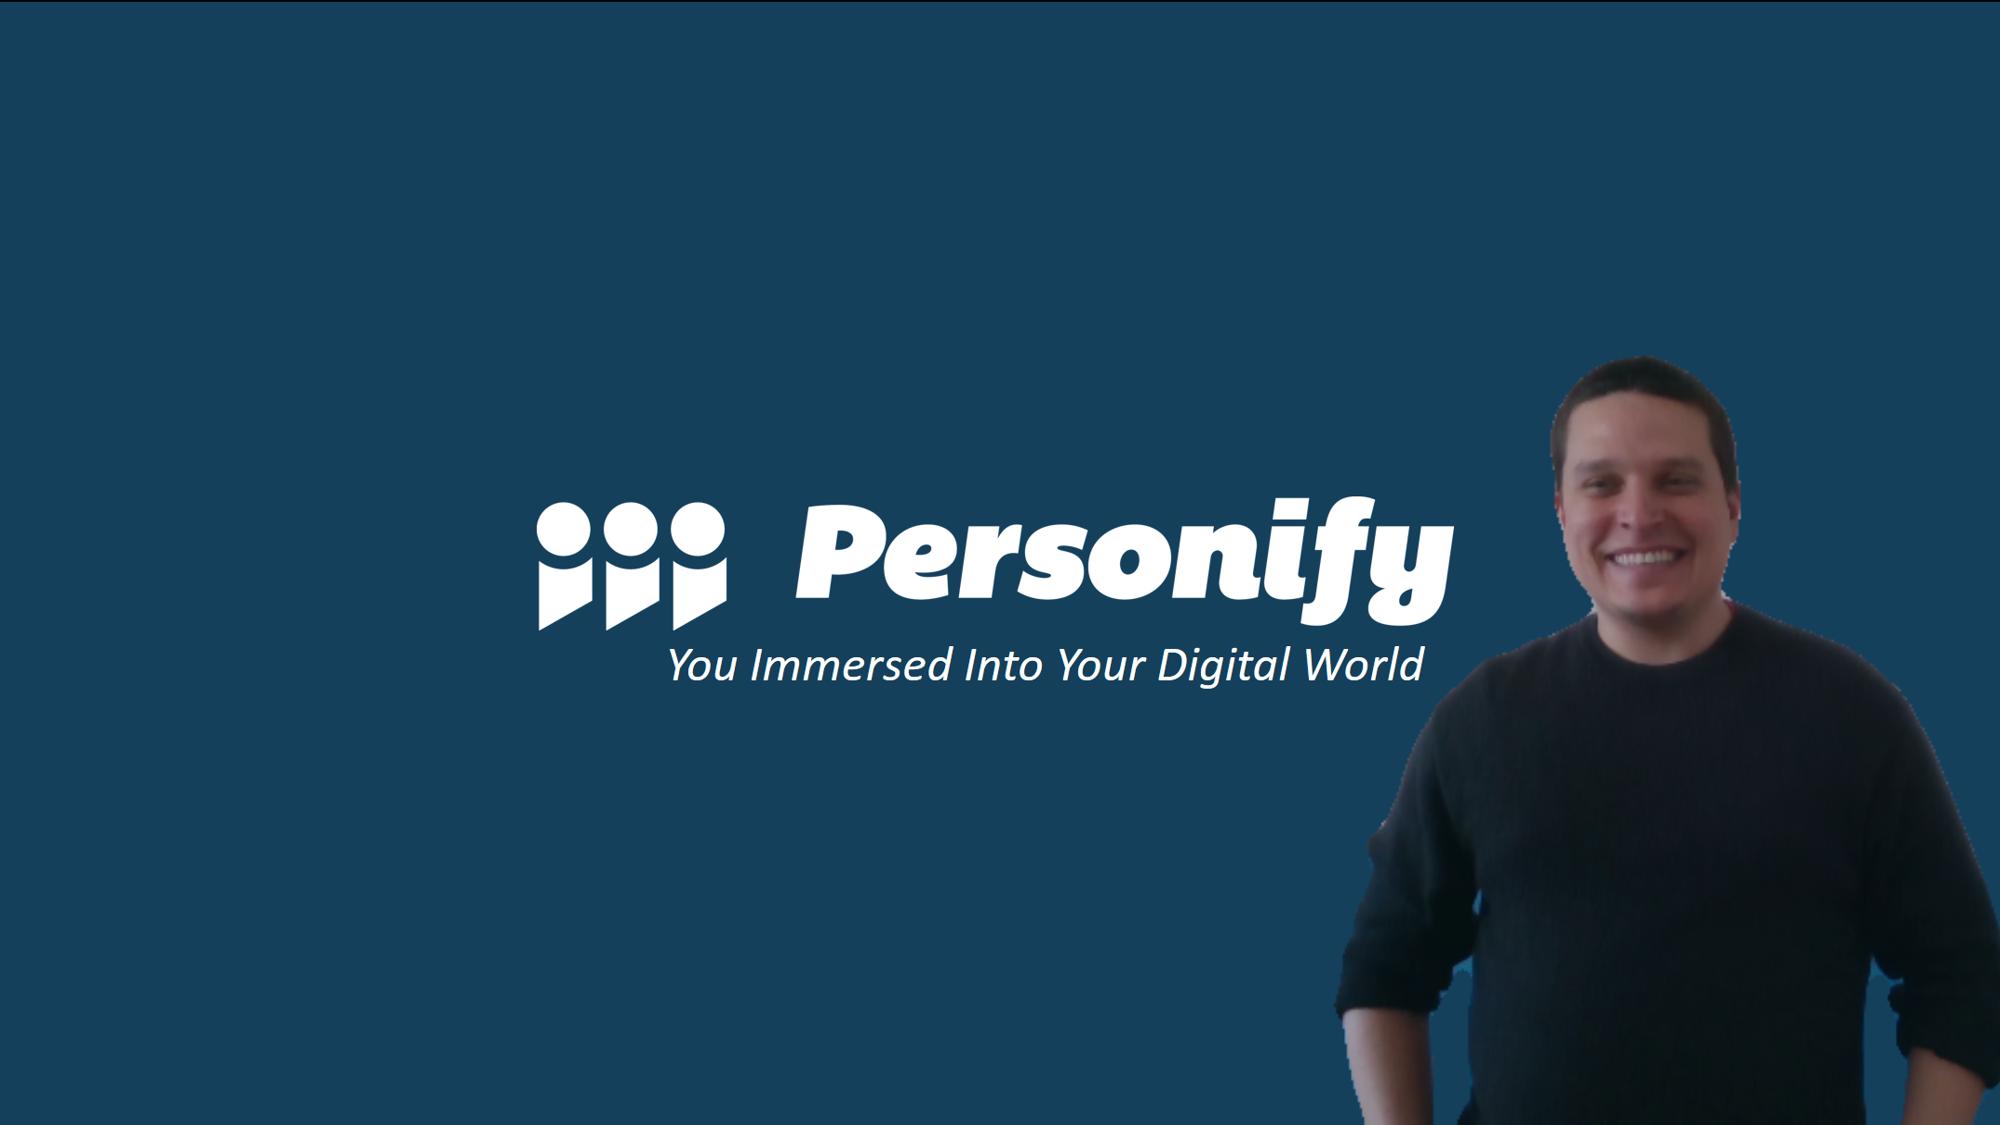 ChromaCam Demo - Persona on Title Slide